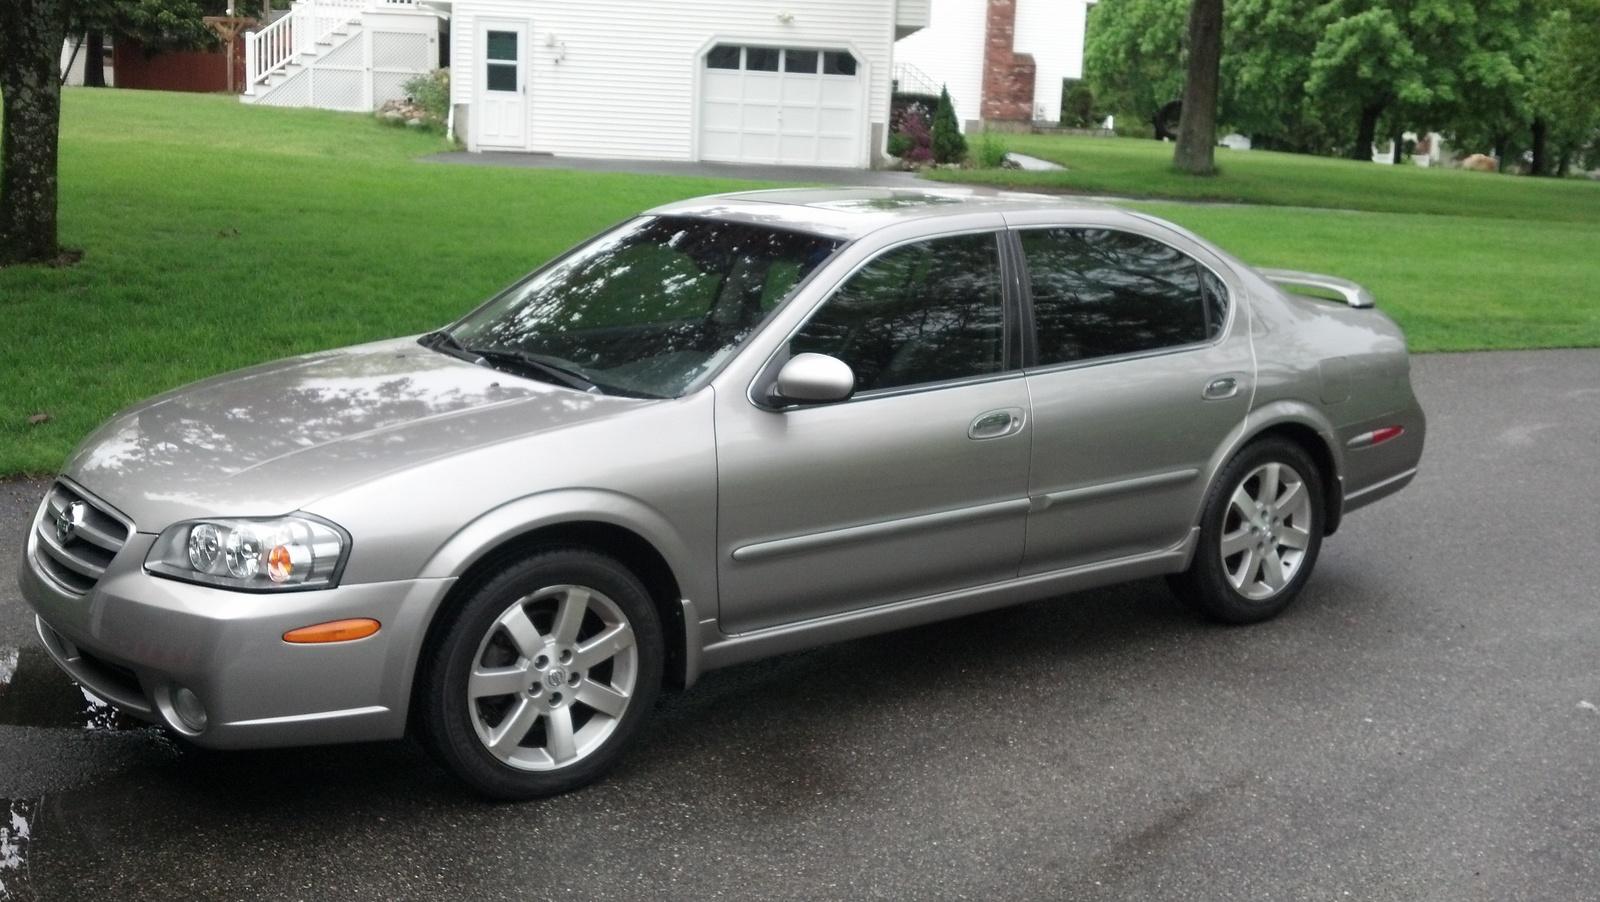 1998 Honda Accord Reviews >> 2002 Nissan Maxima - Exterior Pictures - CarGurus